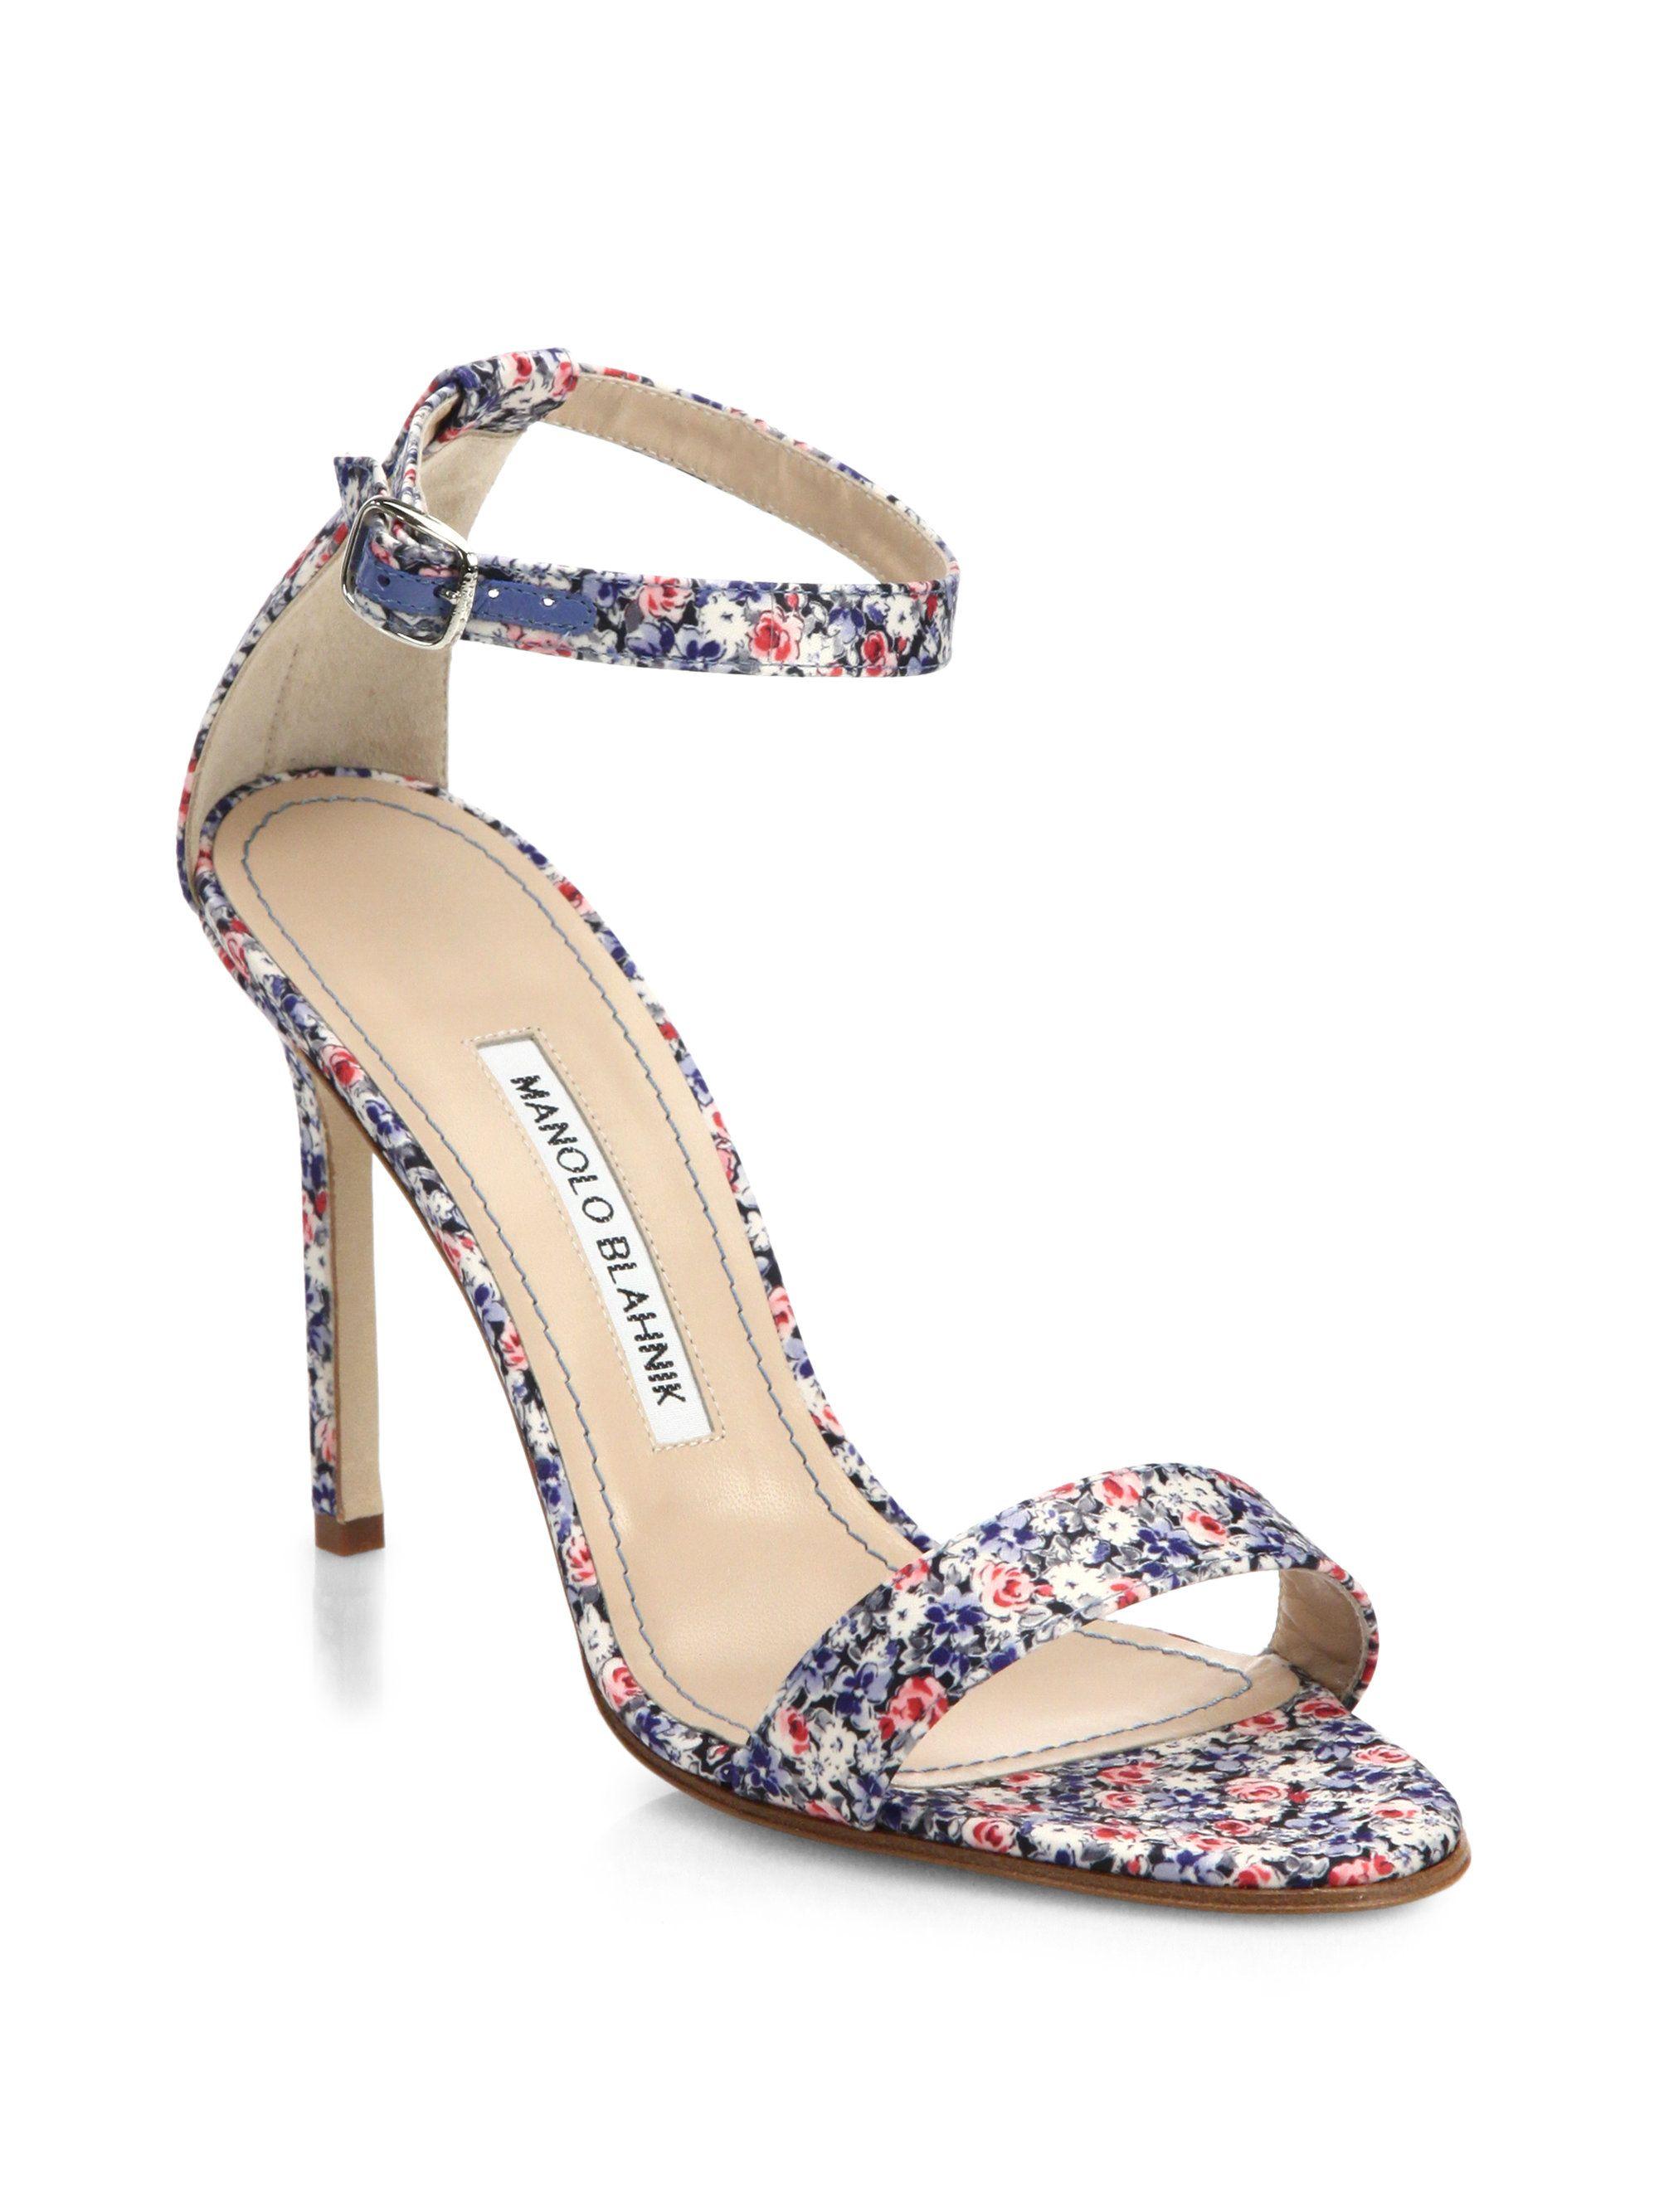 Manolo Blahnik Floral Ankle Strap Sandals cheap sale many kinds of cheap online AbNoI